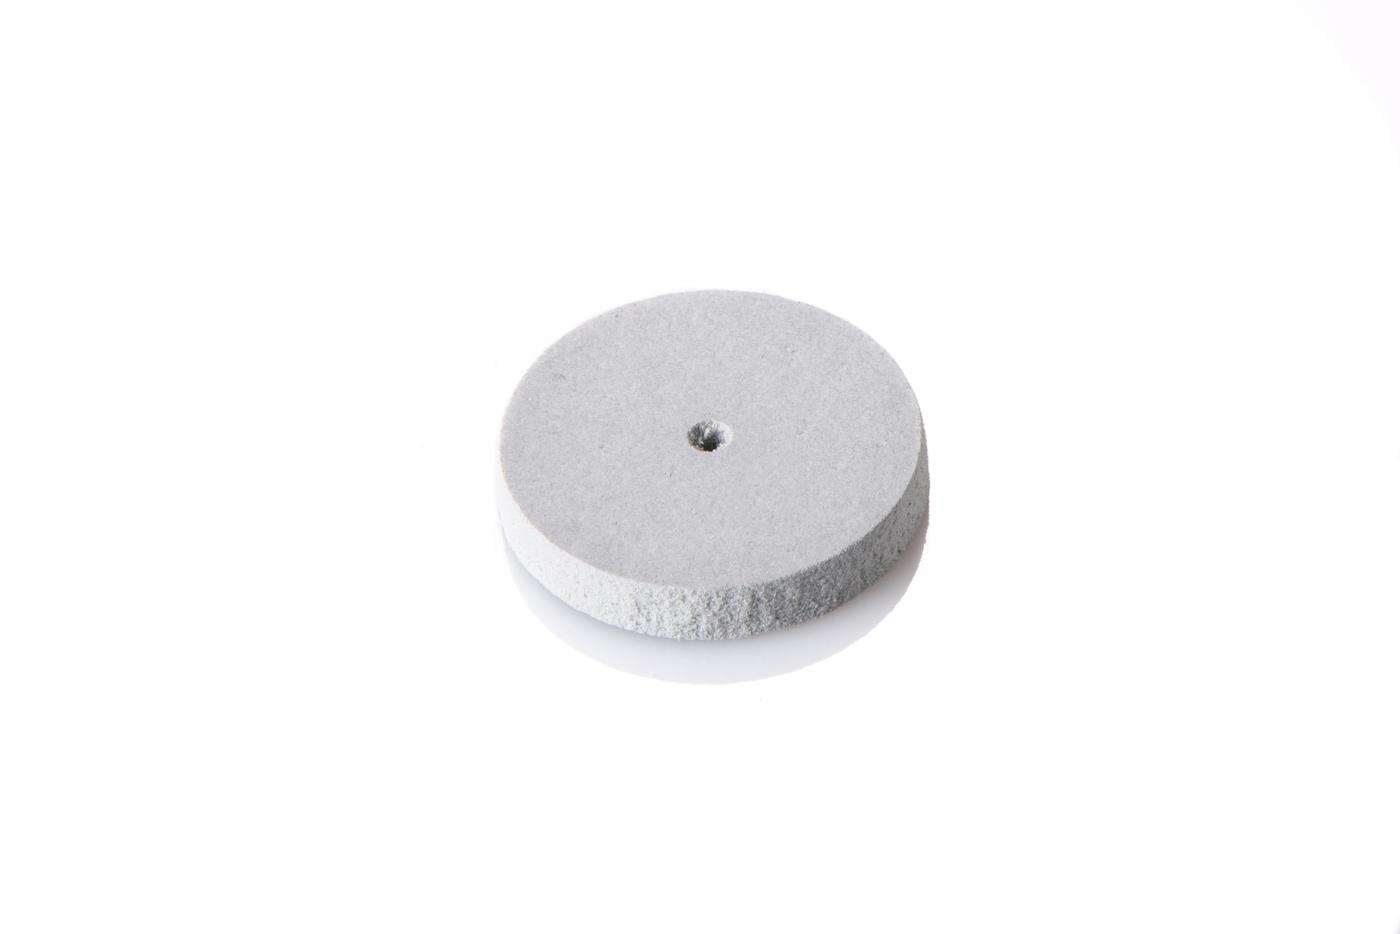 Pacific Abrasives Silicone Carbide Square Edge Wheels, 7/8